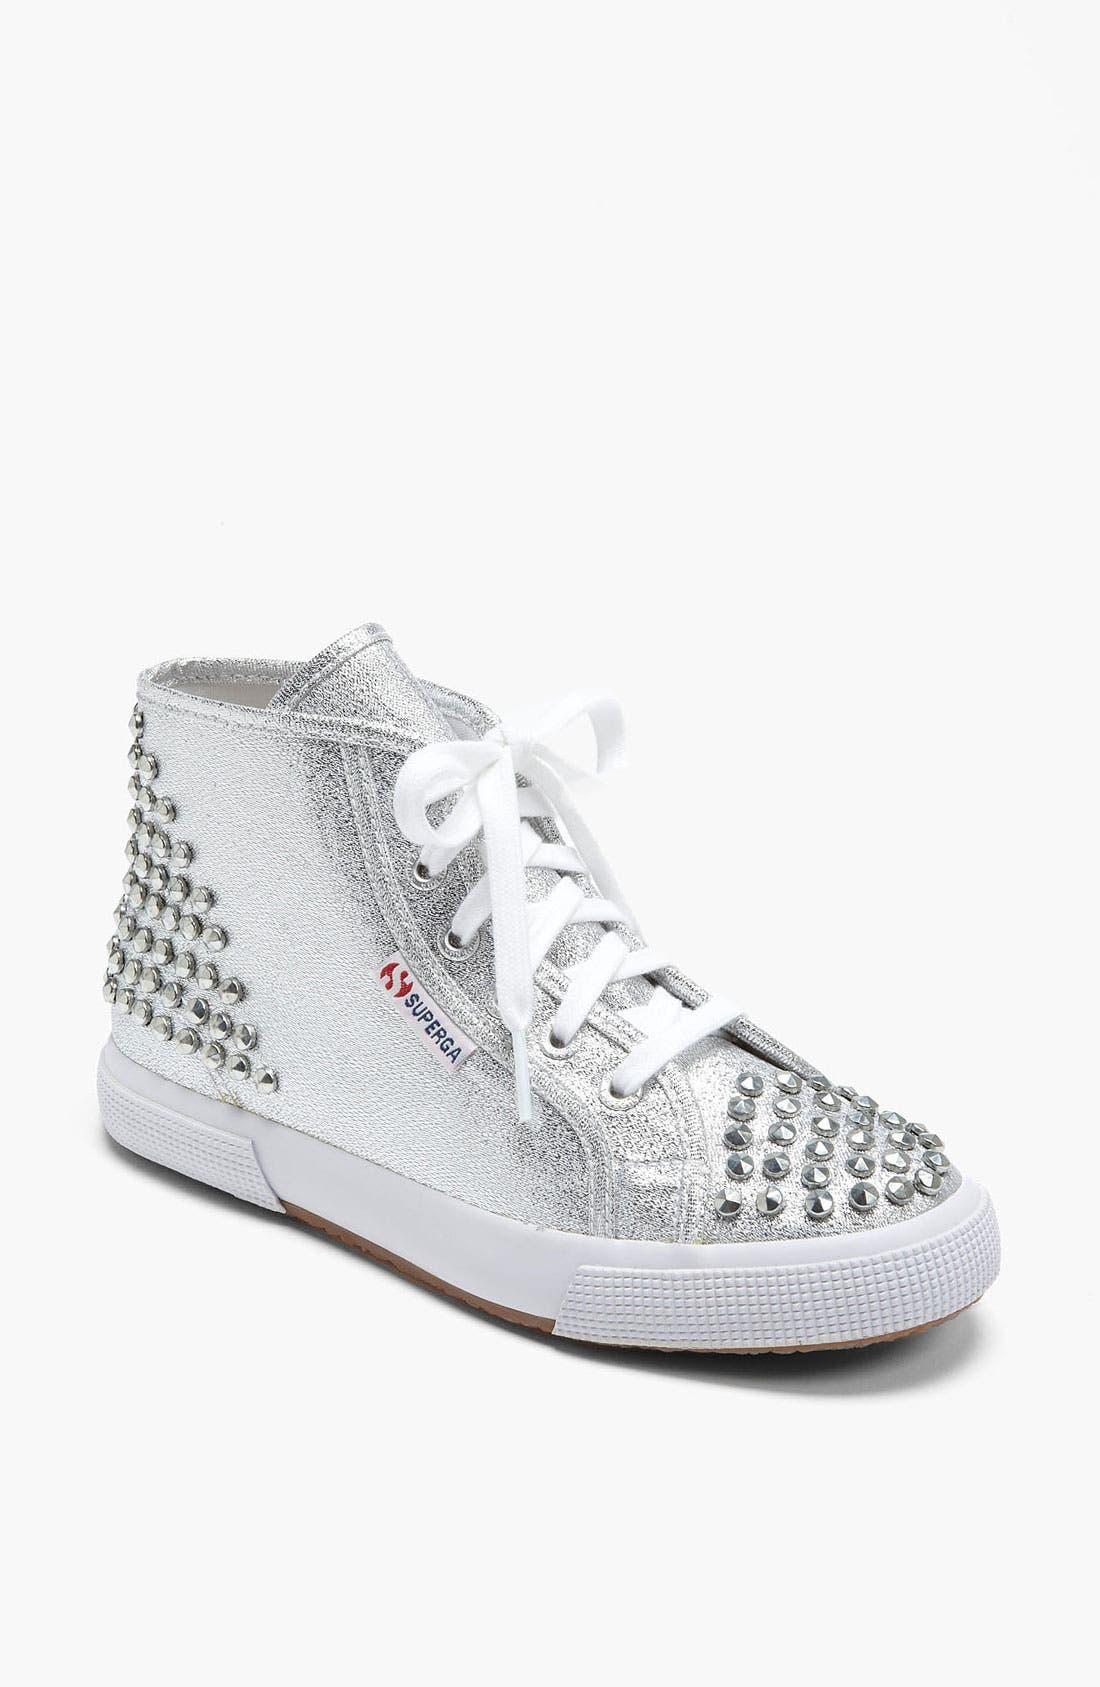 Alternate Image 1 Selected - Superga 'Lamé Studs' Sneaker (Women)